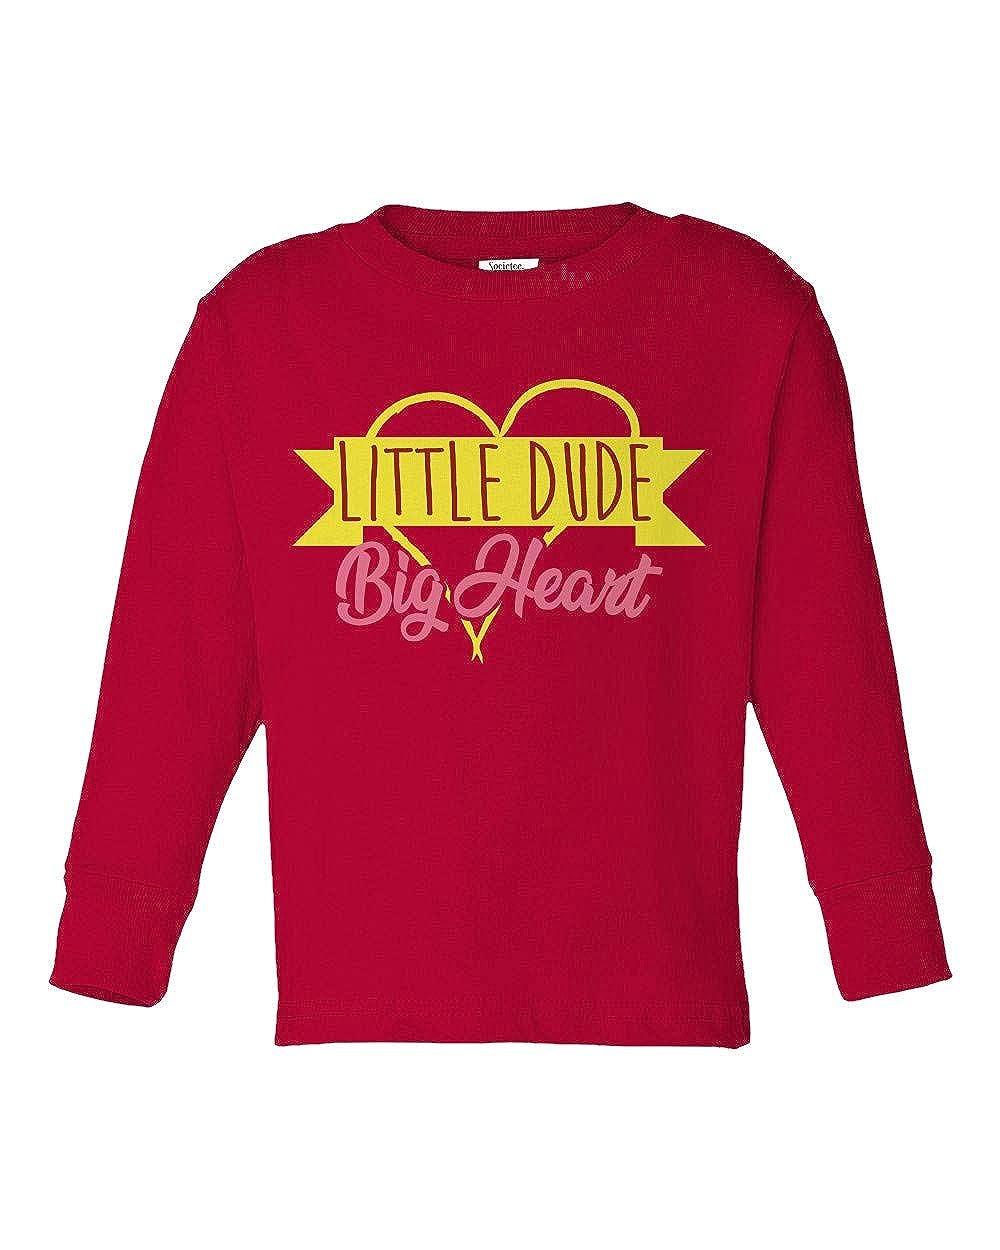 Societee Little Dude Big Heart Girls Boys Toddler Long Sleeve T-Shirt